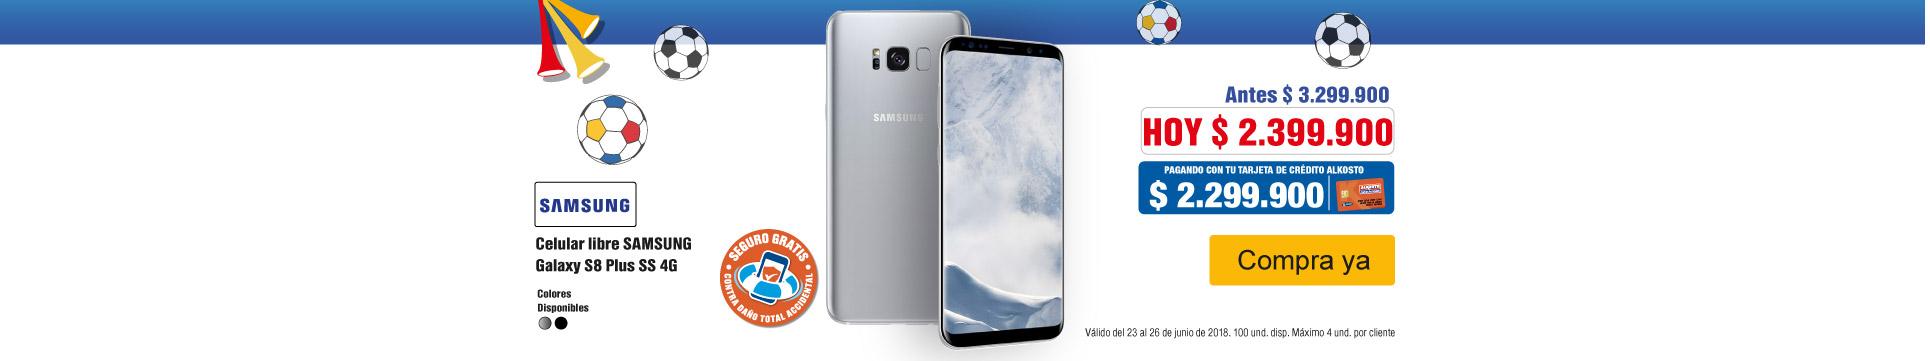 AK-HIPER-4-celulares-PP---Samsung-S8-Plus-Jun23